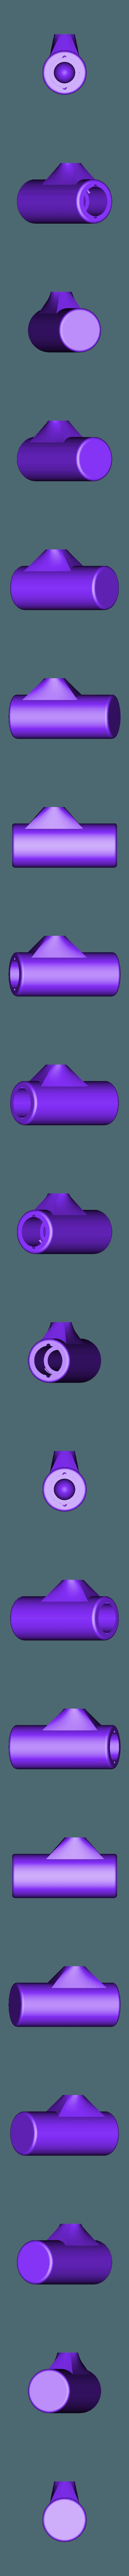 Bullet_puller_head_tall.stl Download free STL file Bullet puller • 3D printable design, LionFox